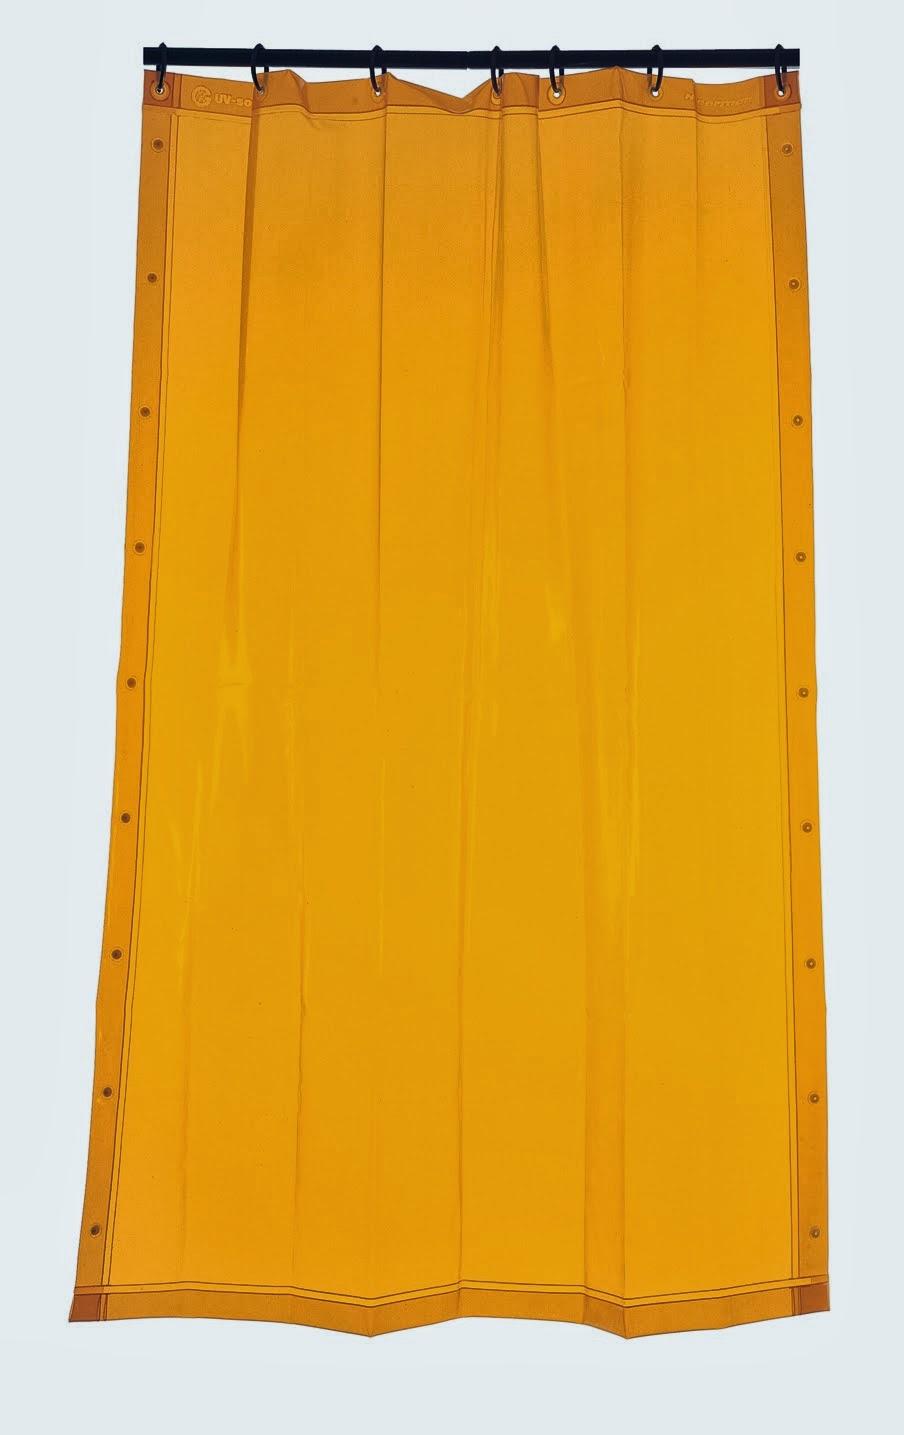 welding_curtain_yellow_transparent_22821341343_o.jpg